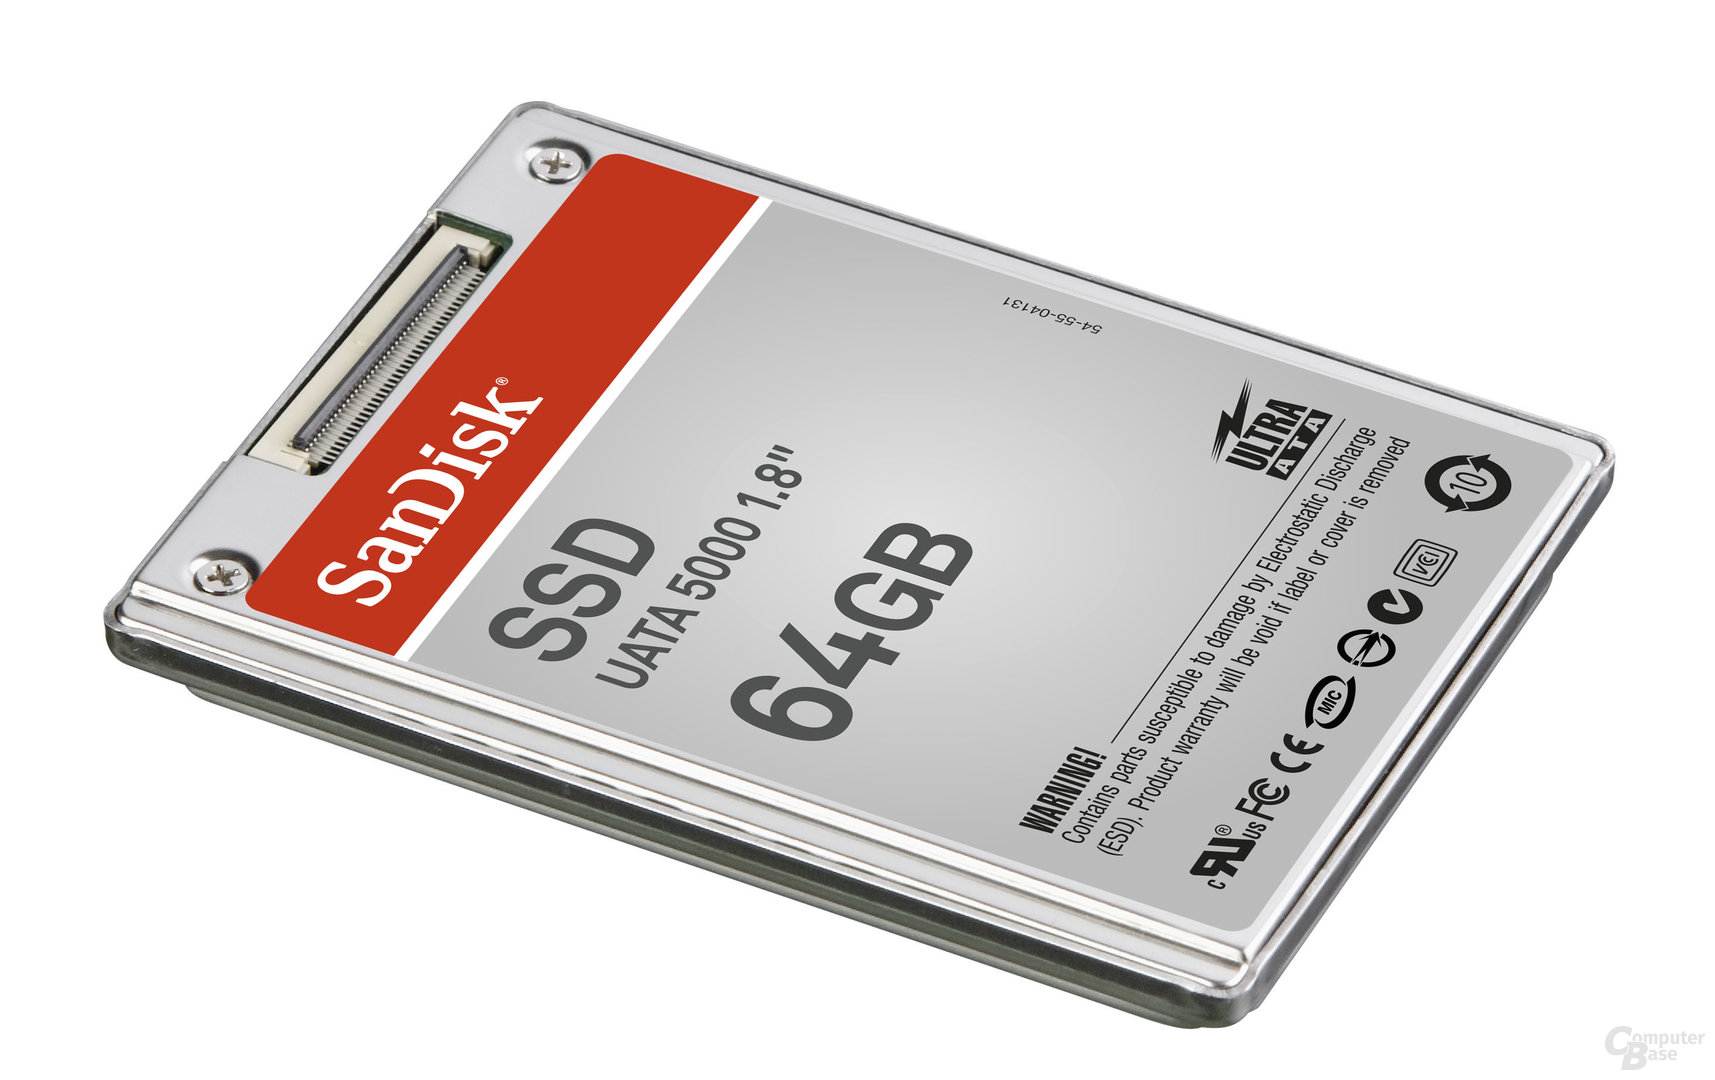 "SanDisk SSD UATA 50001.8"" 64GB"